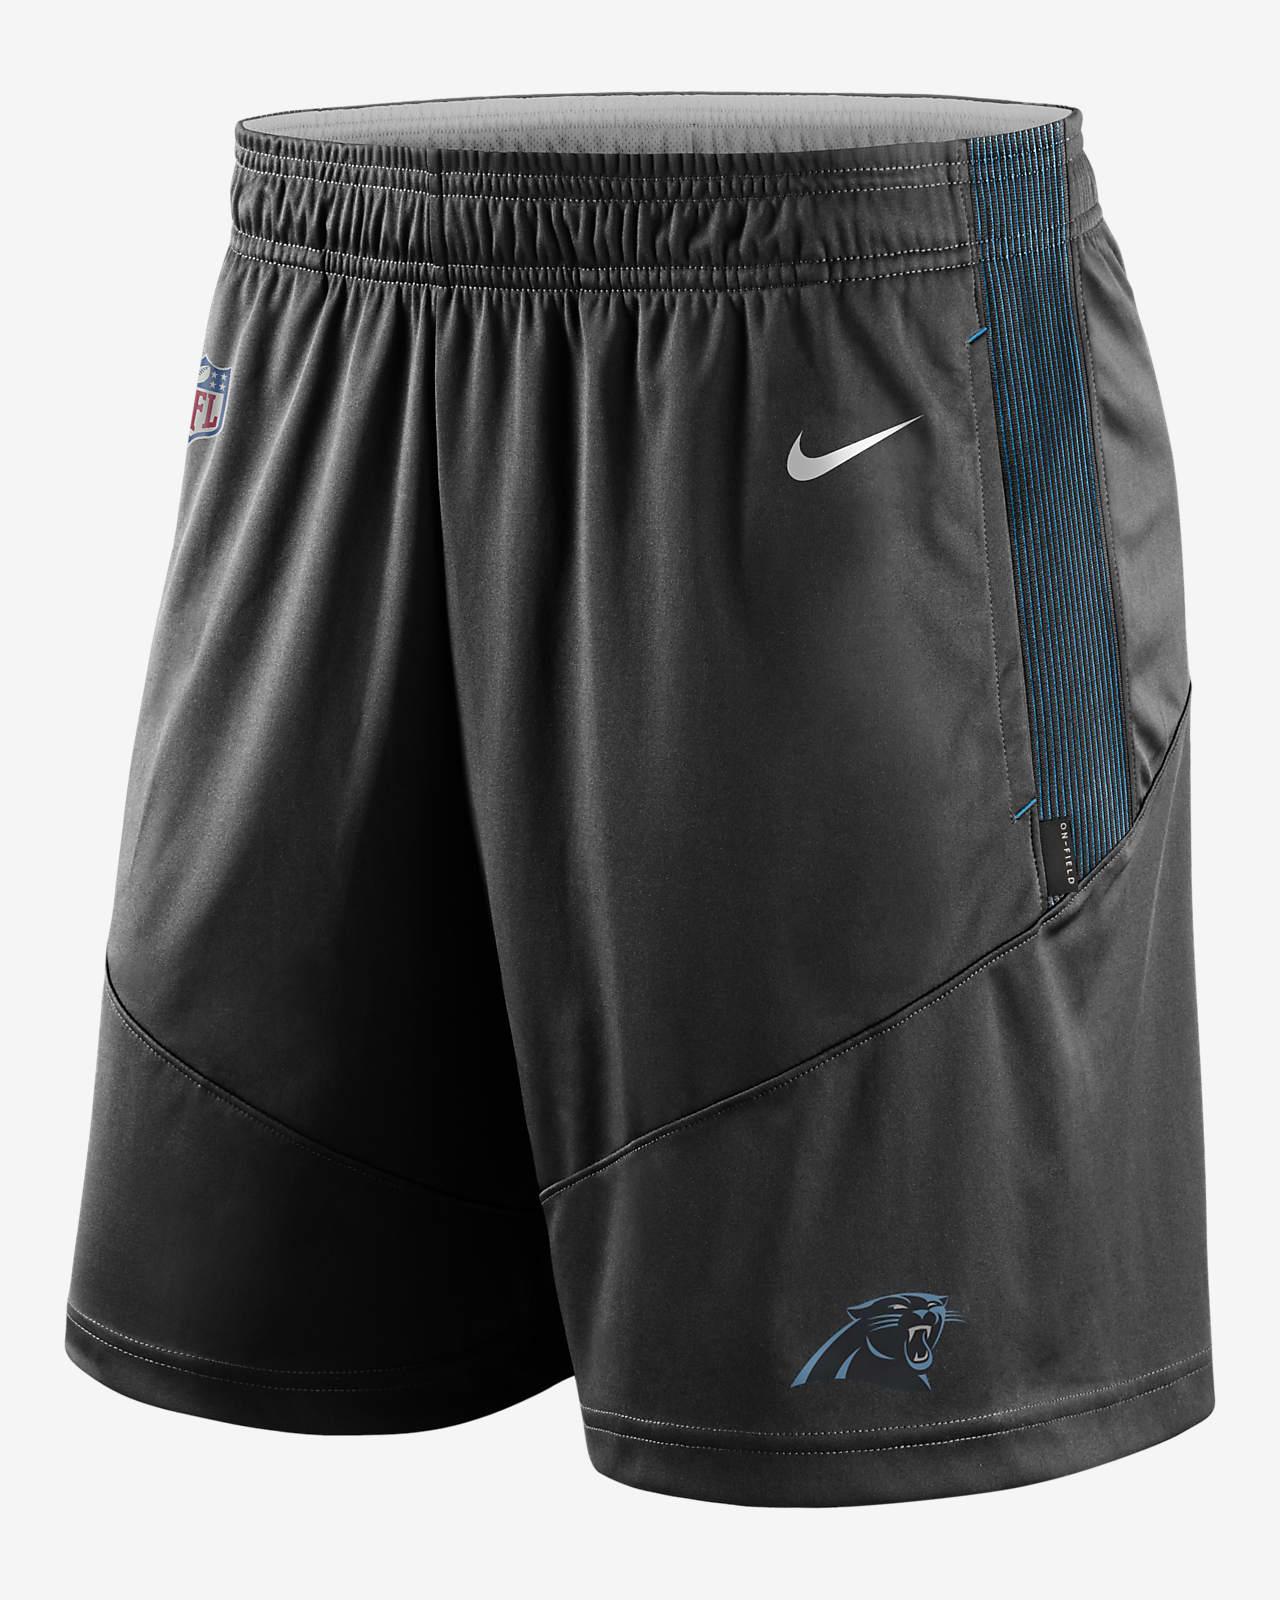 Nike Dri-FIT Sideline (NFL Carolina Panthers) Men's Shorts